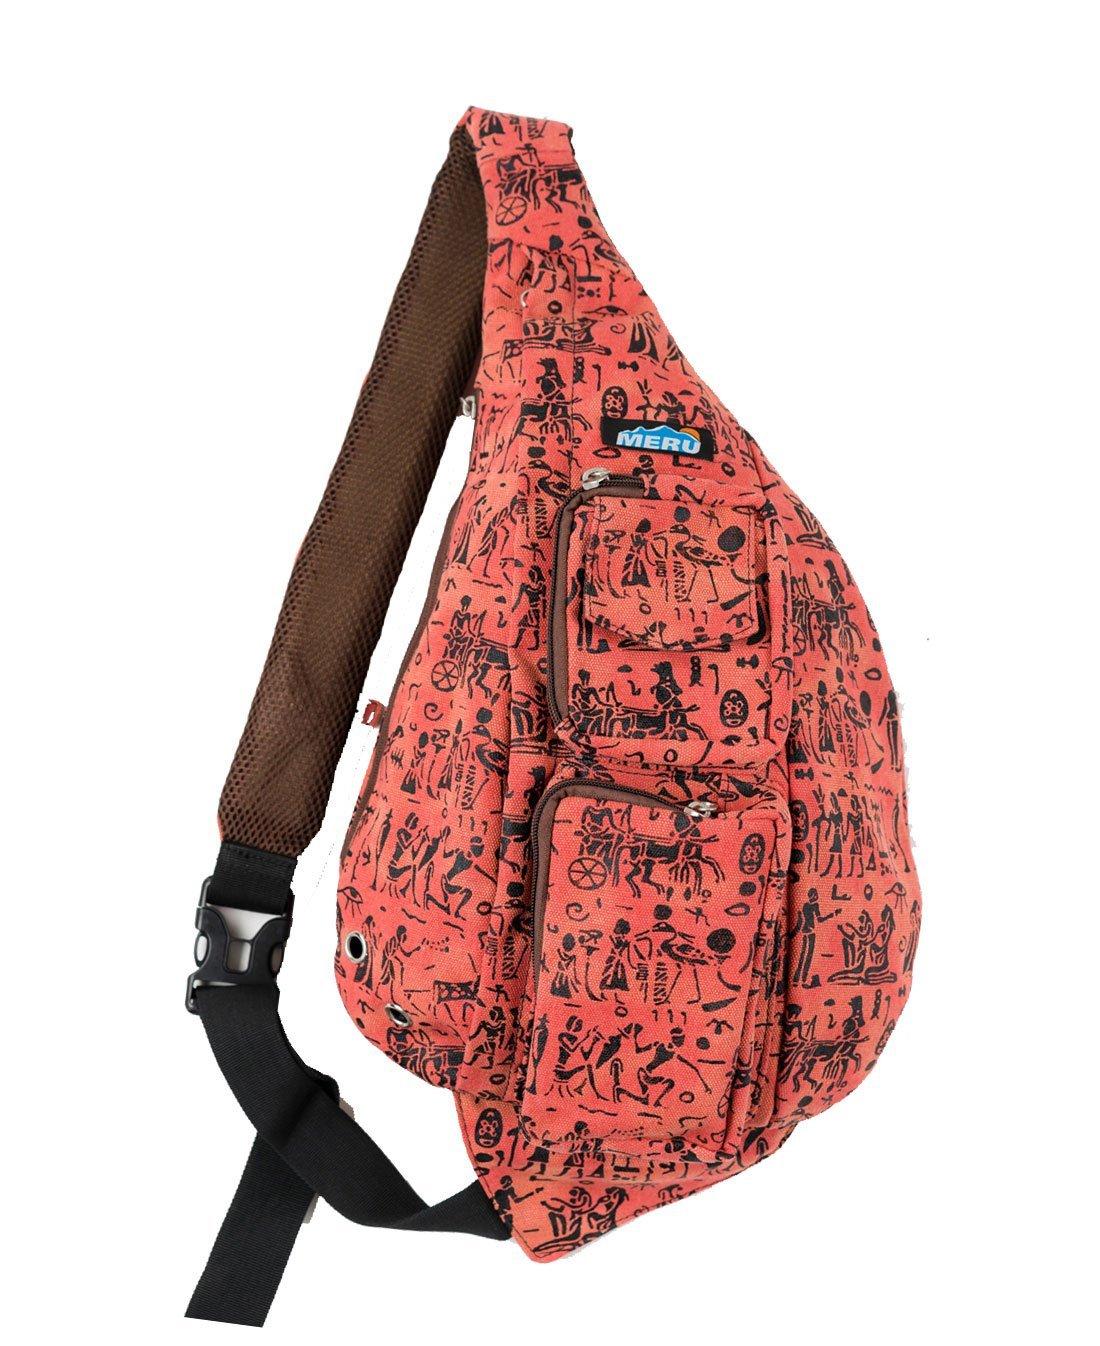 Meru Sling Backpack Bag